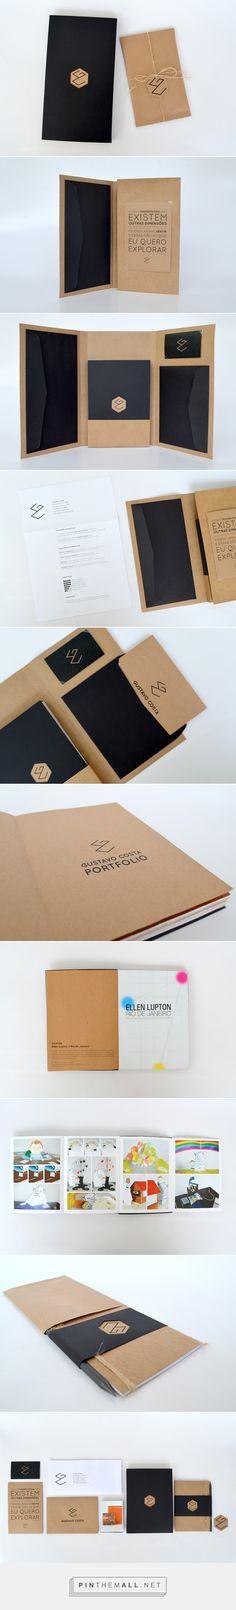 Self Promotion Kit | Gustavo Costa on Behance - created via http://pinthemall.net